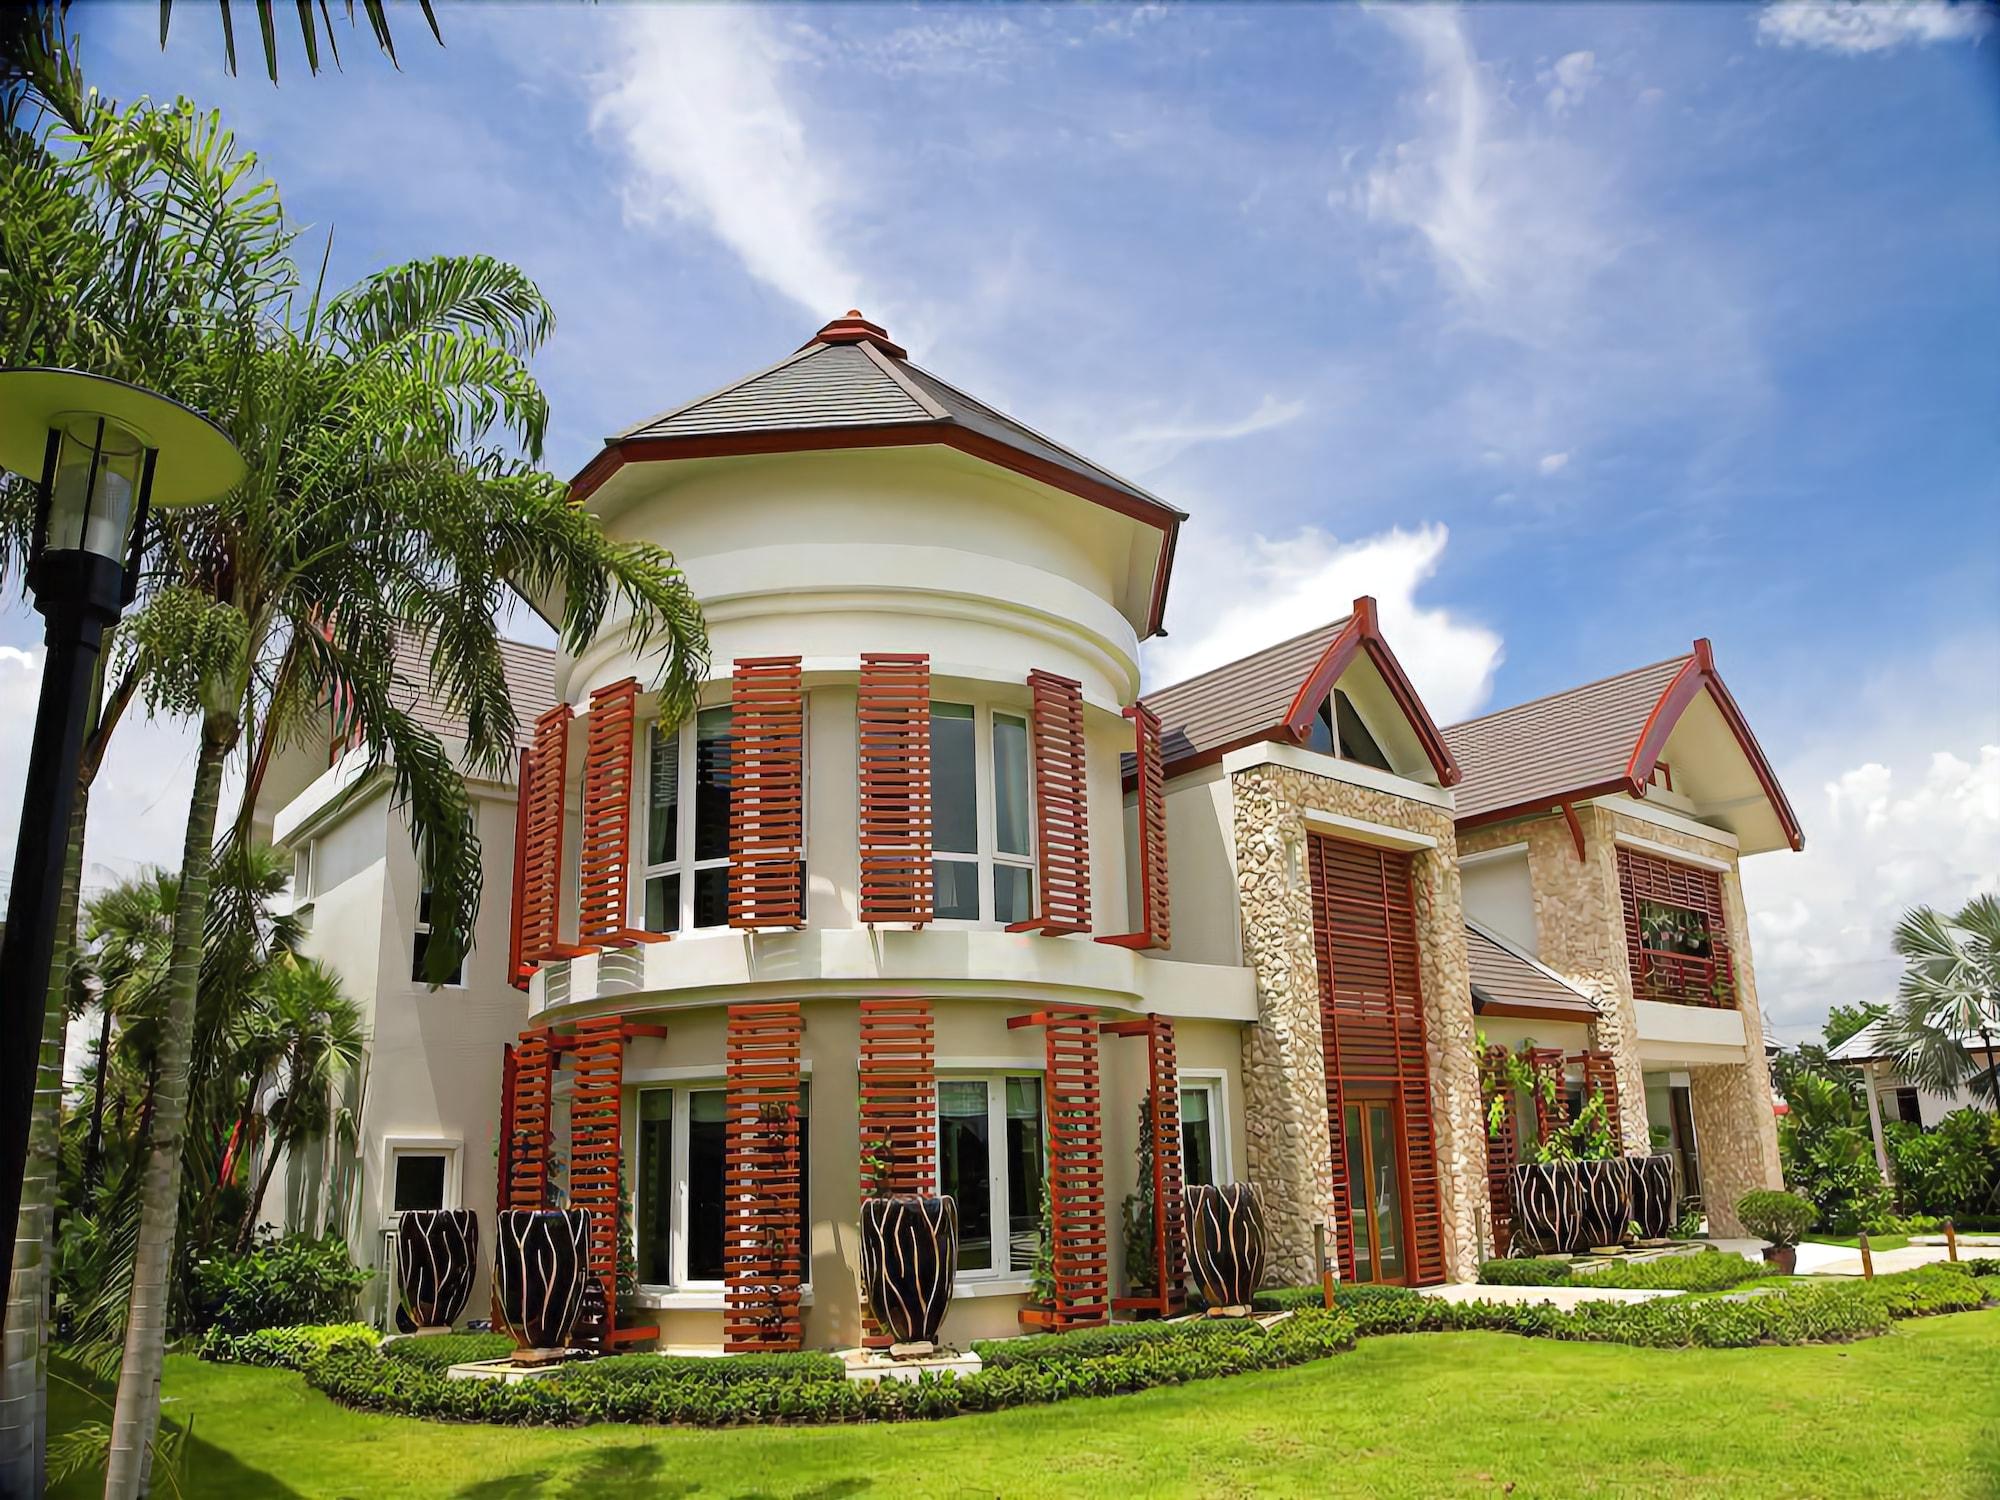 Royal Sammuk villas, Pattaya